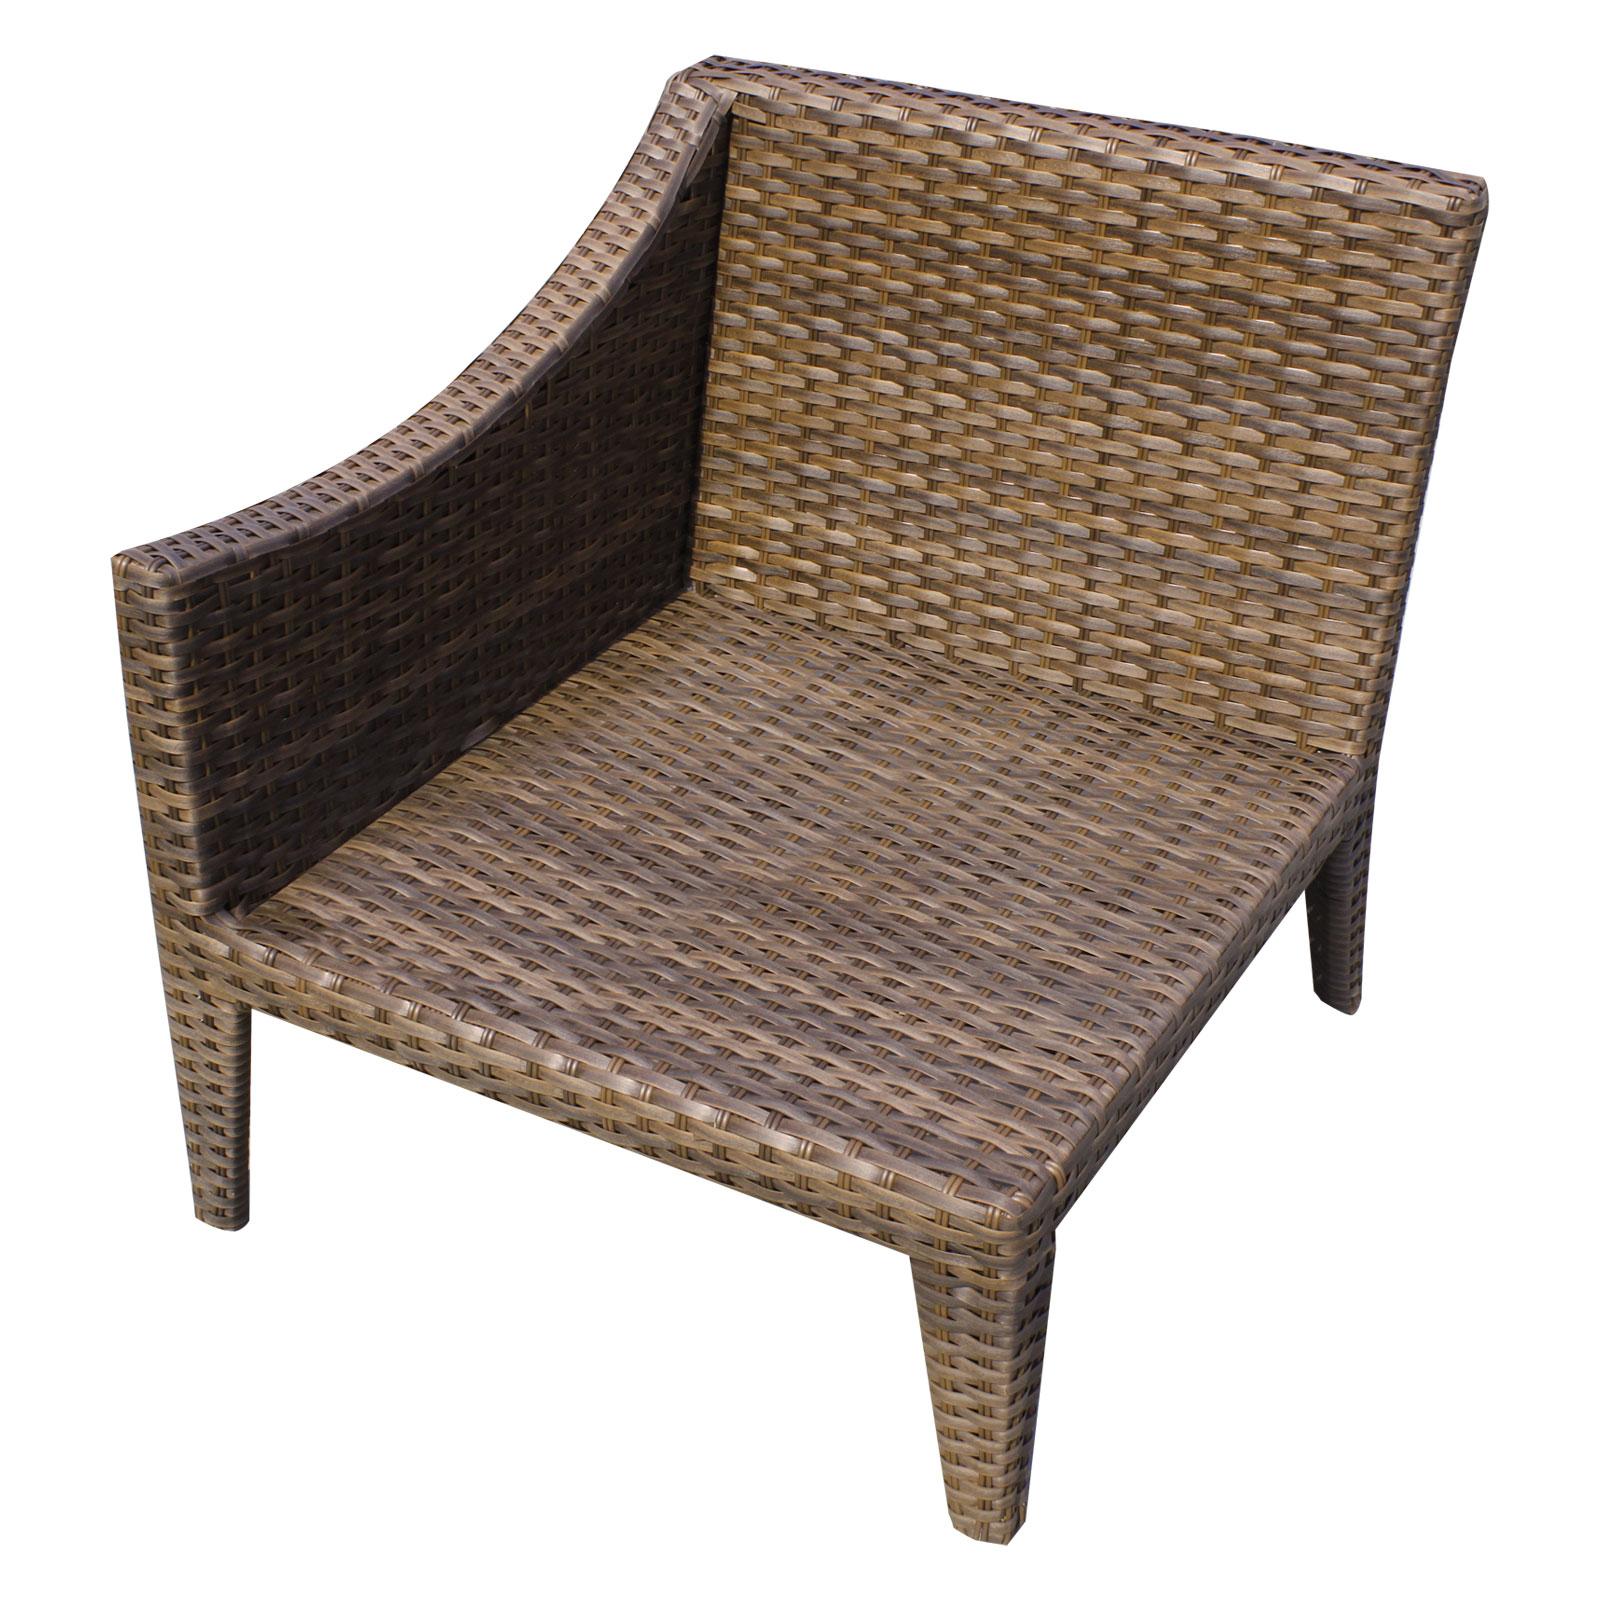 Manhattan 2 Piece Outdoor Wicker Patio Furniture Set 02a -